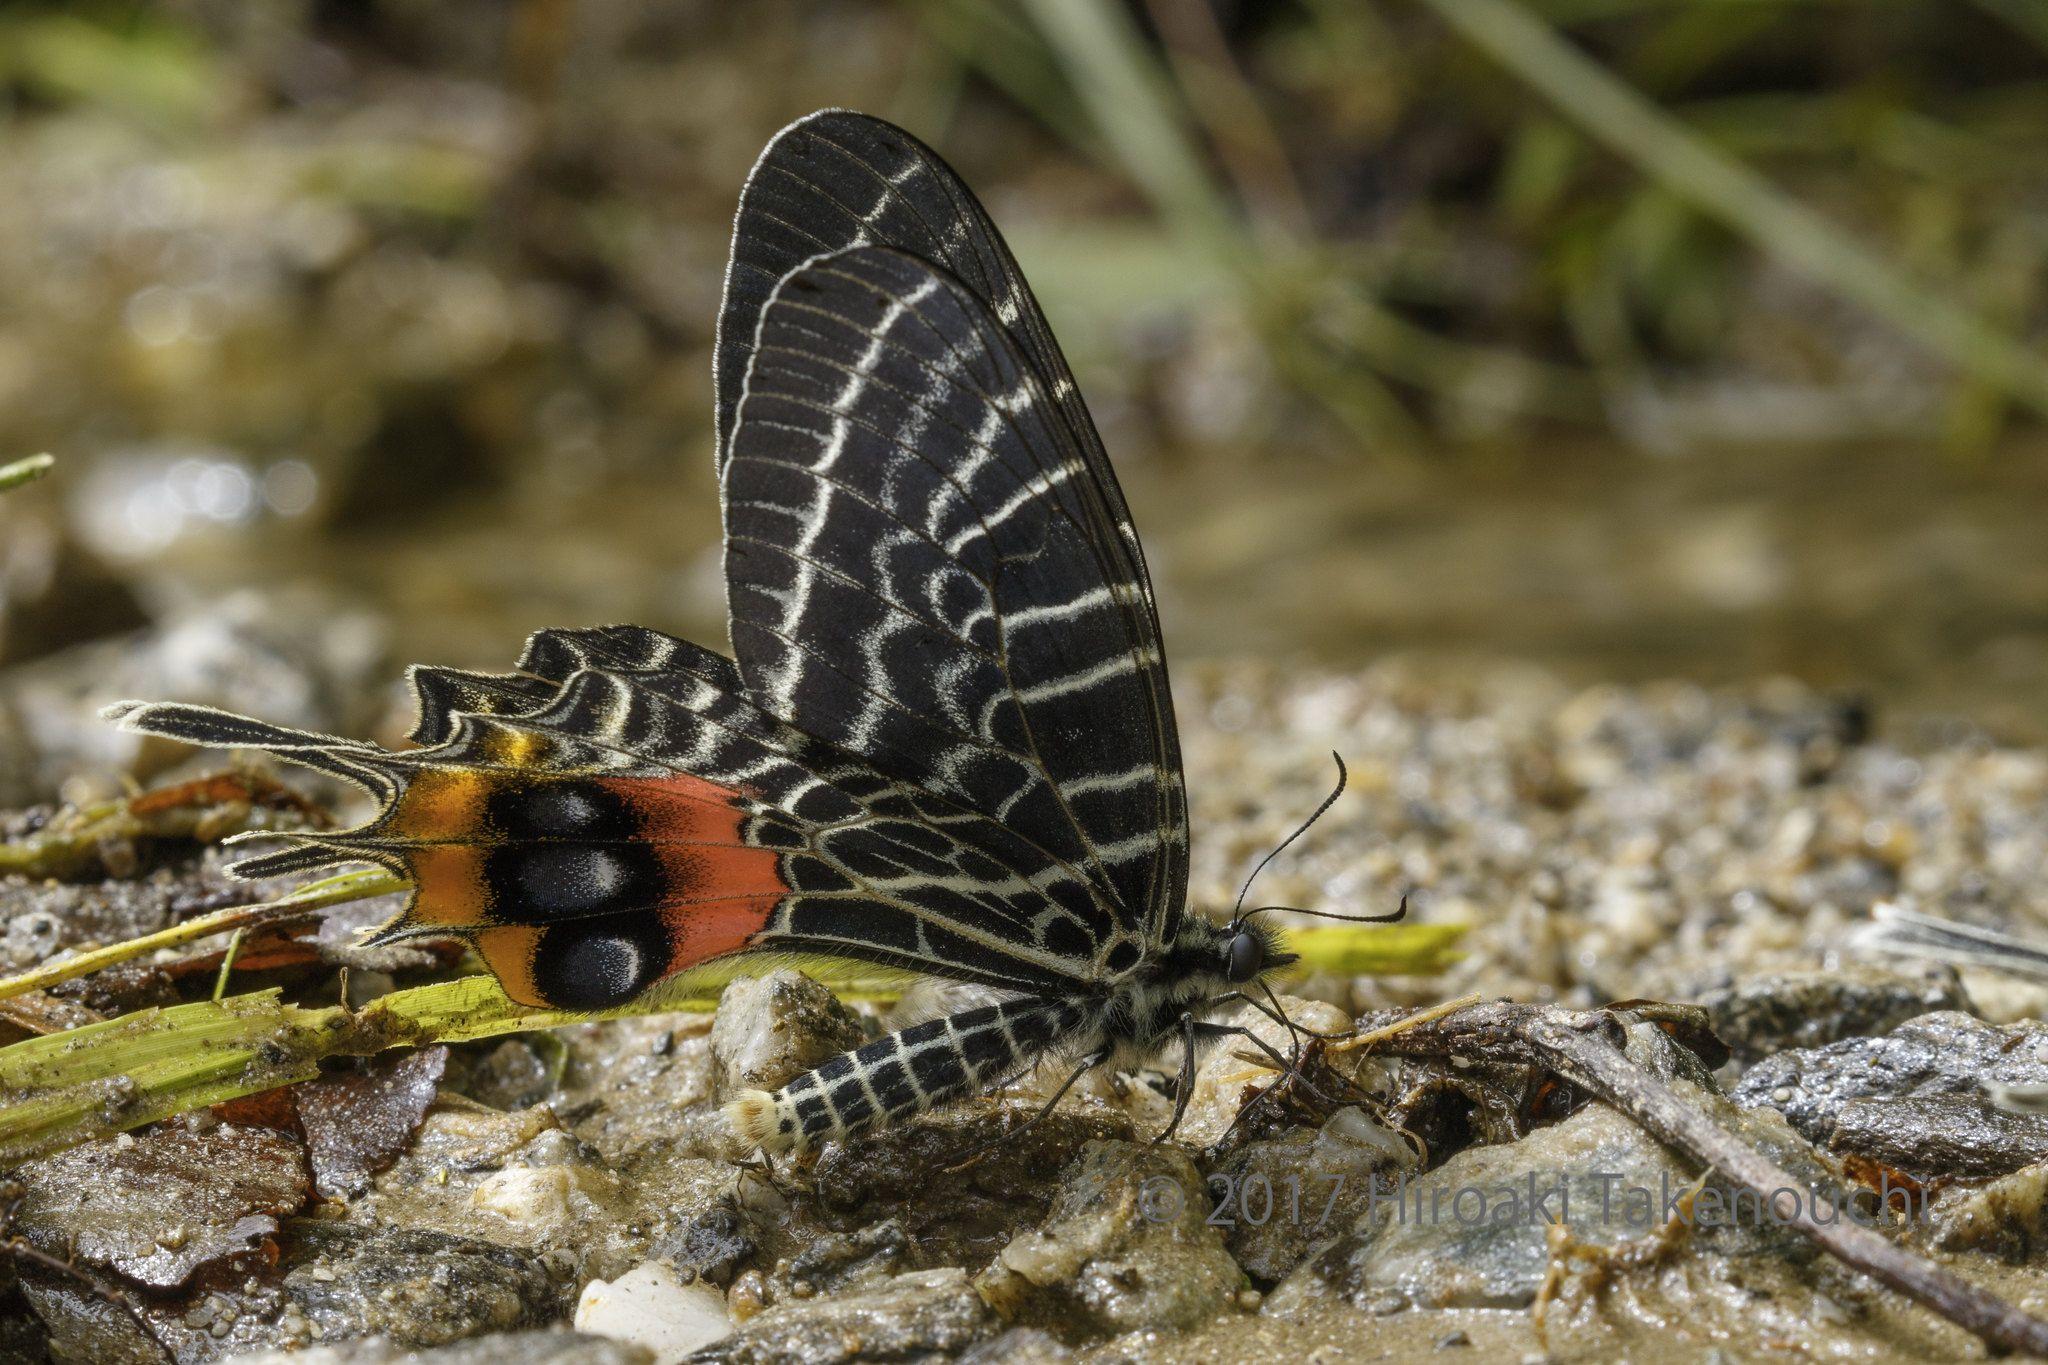 Bhutanitis lidderdalii シボリアゲハ Beautiful butterflies